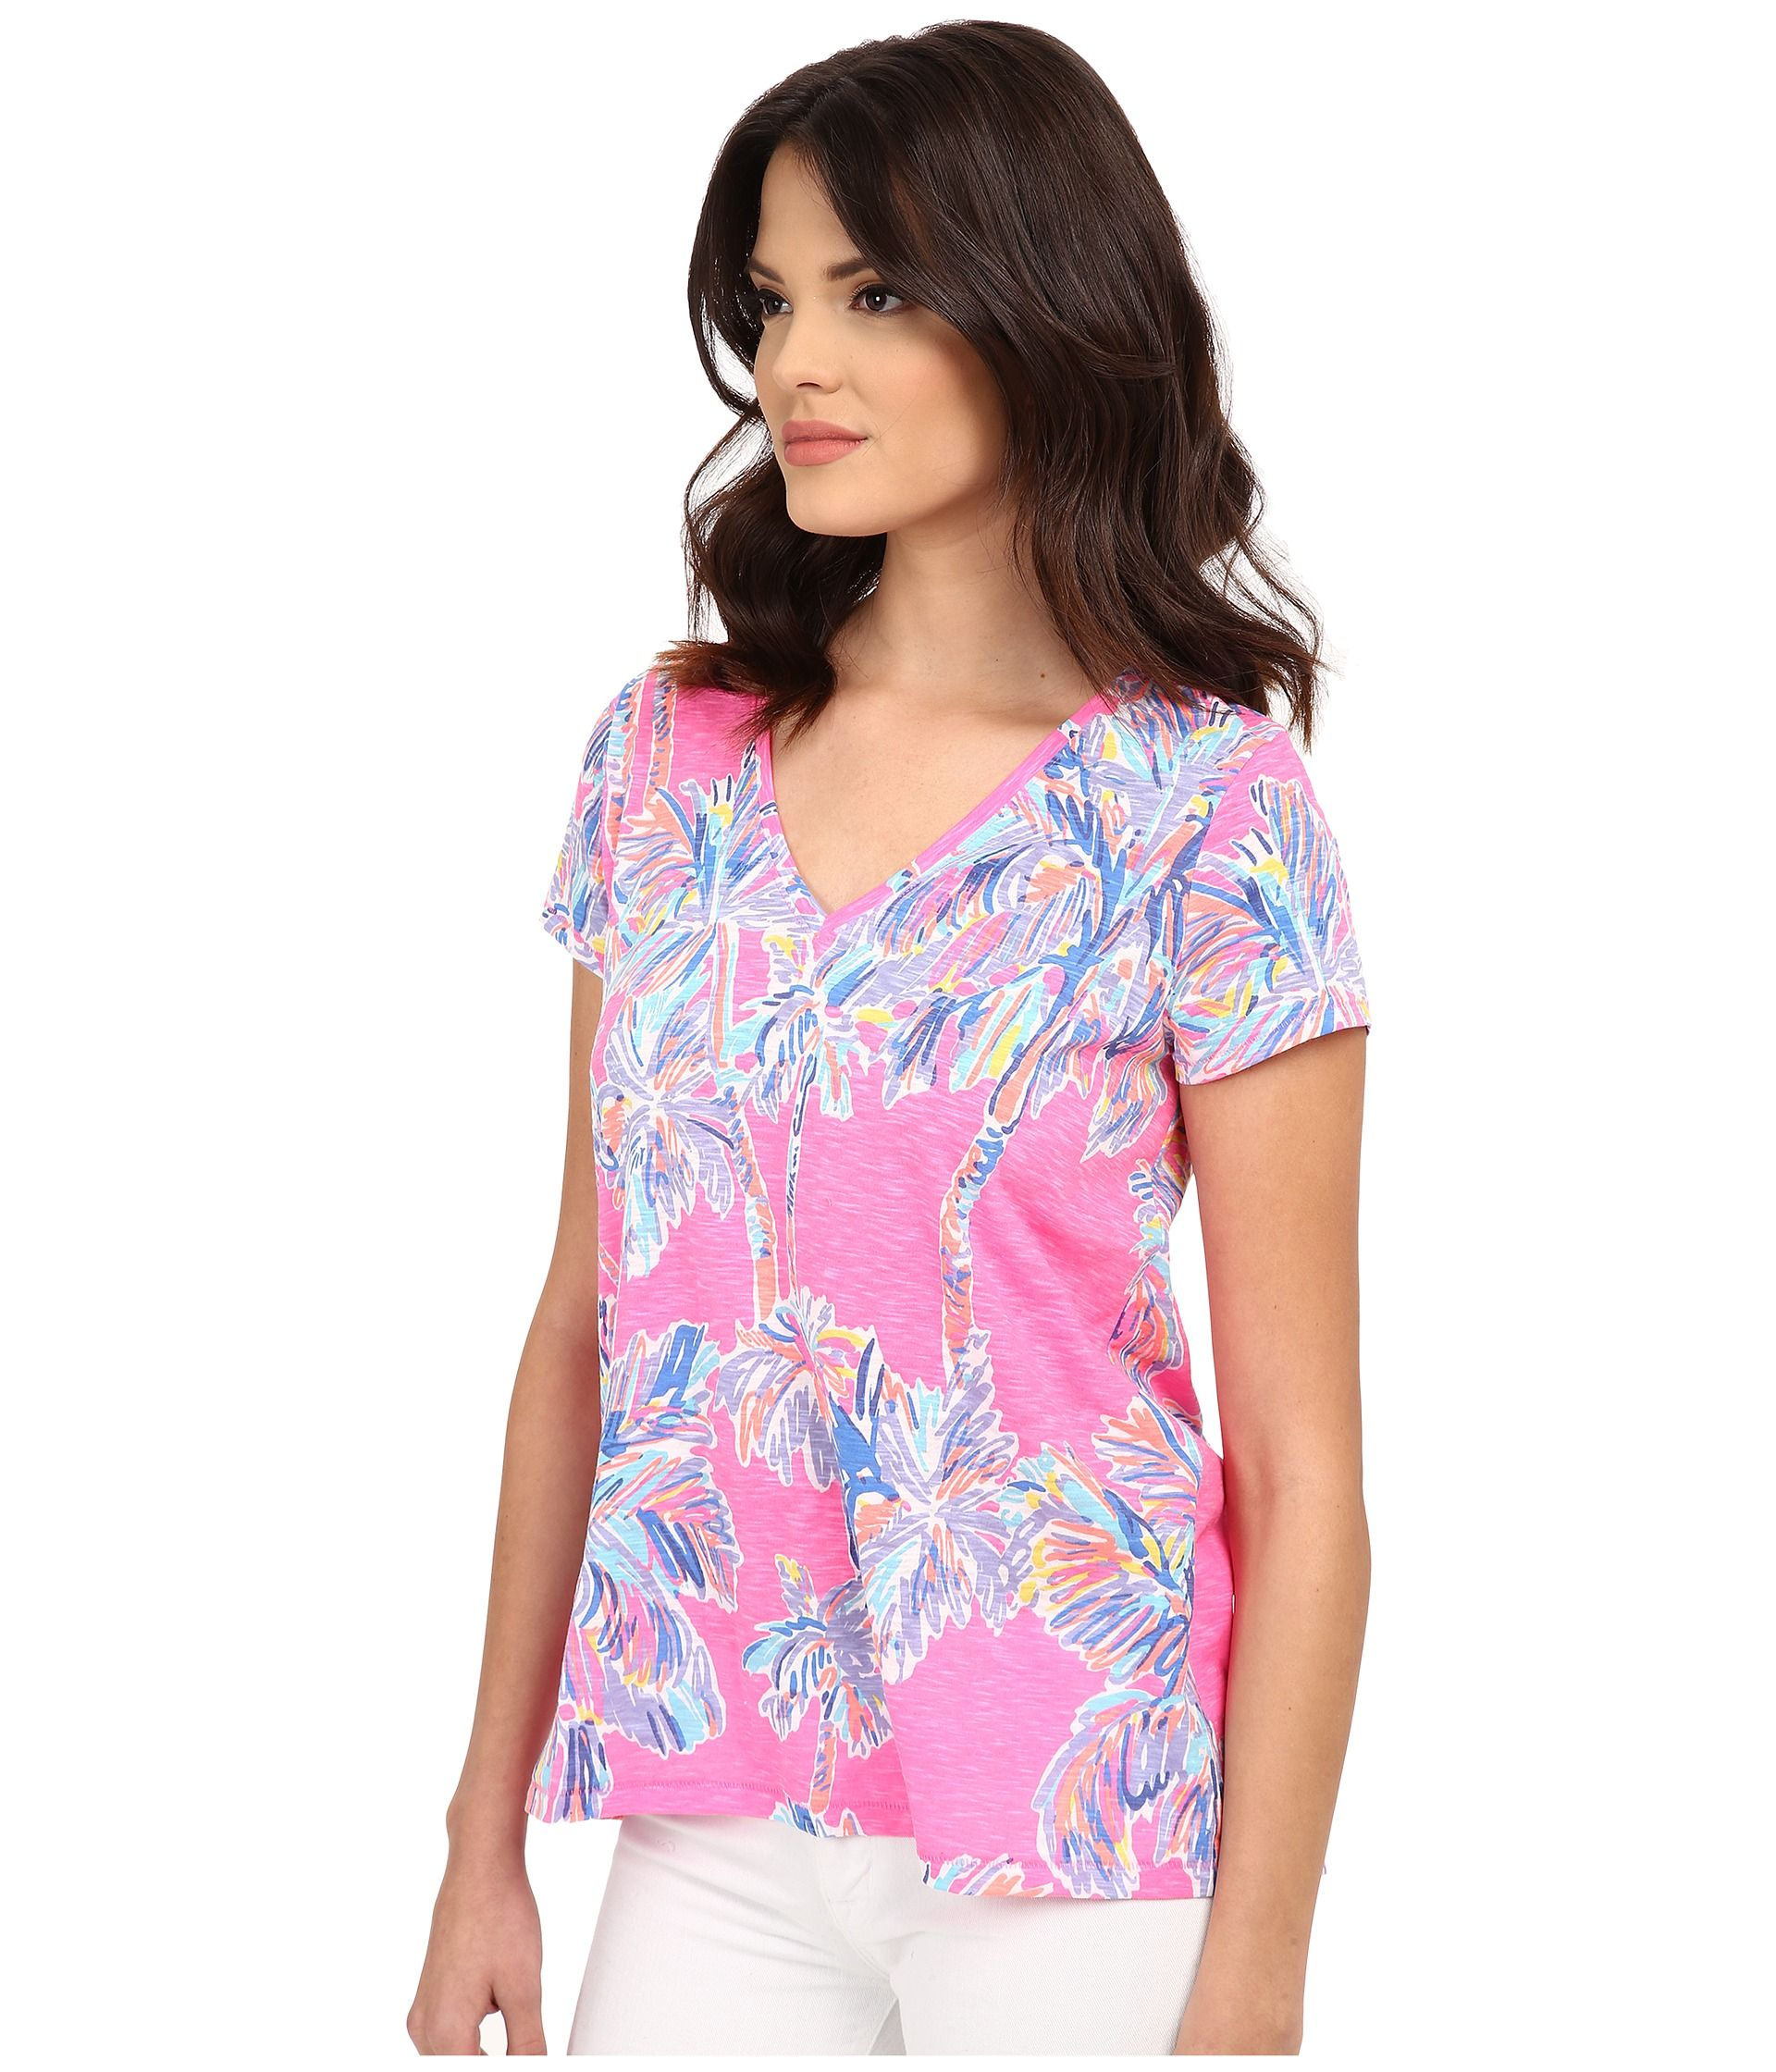 Etta Top in Flamingo Pink Nice Stems | Fiestas | Pinterest ...